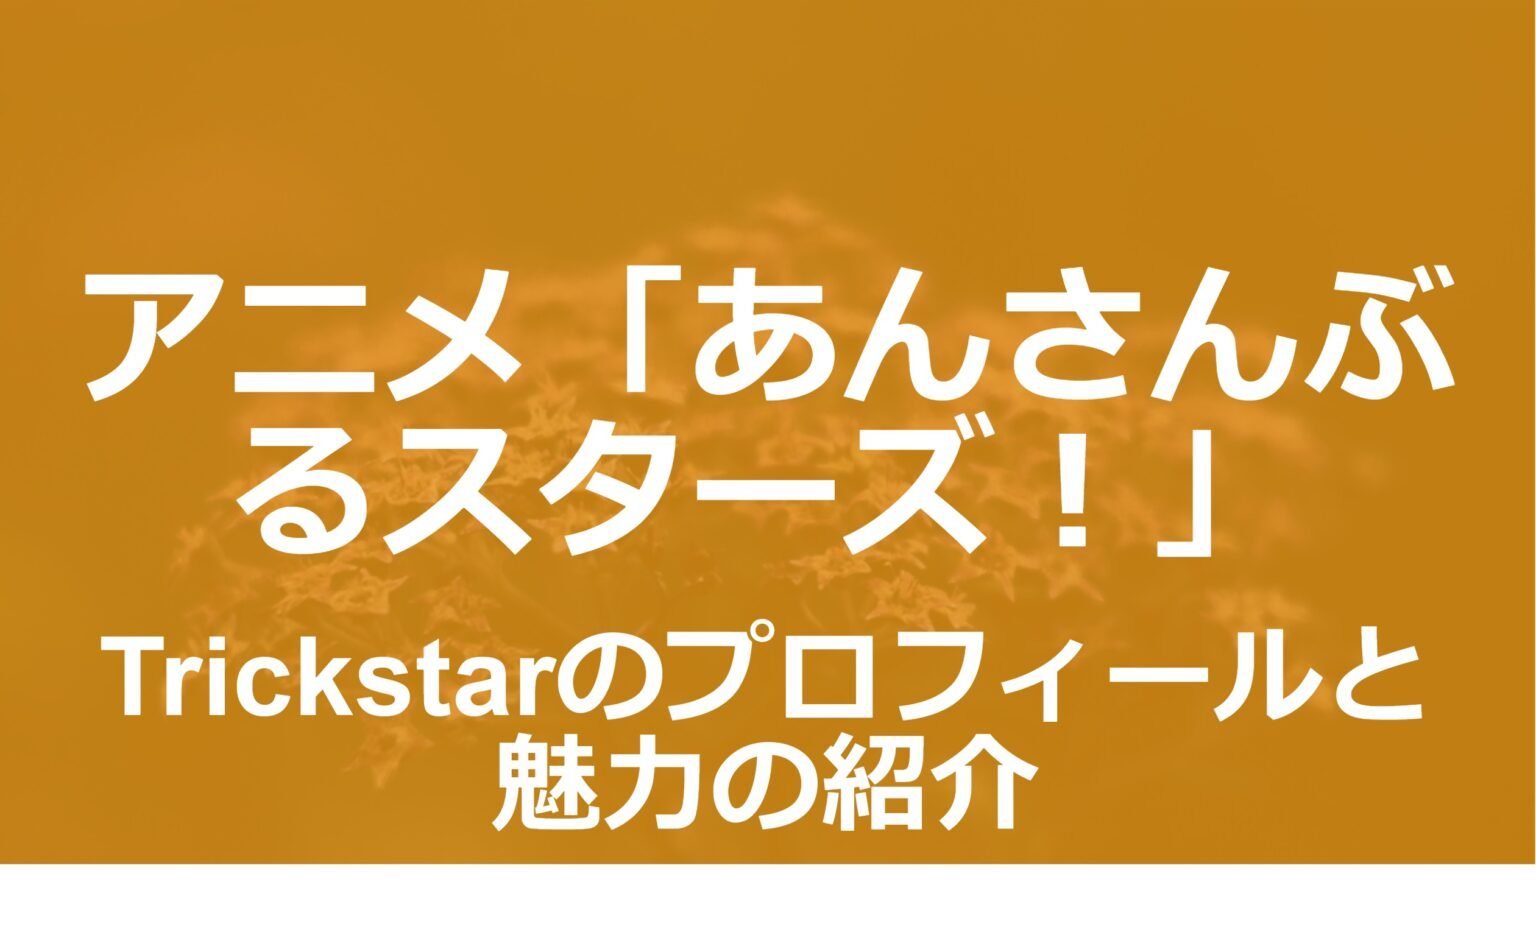 Trickstarのプロフィール一覧とユニットの魅力を紹介!